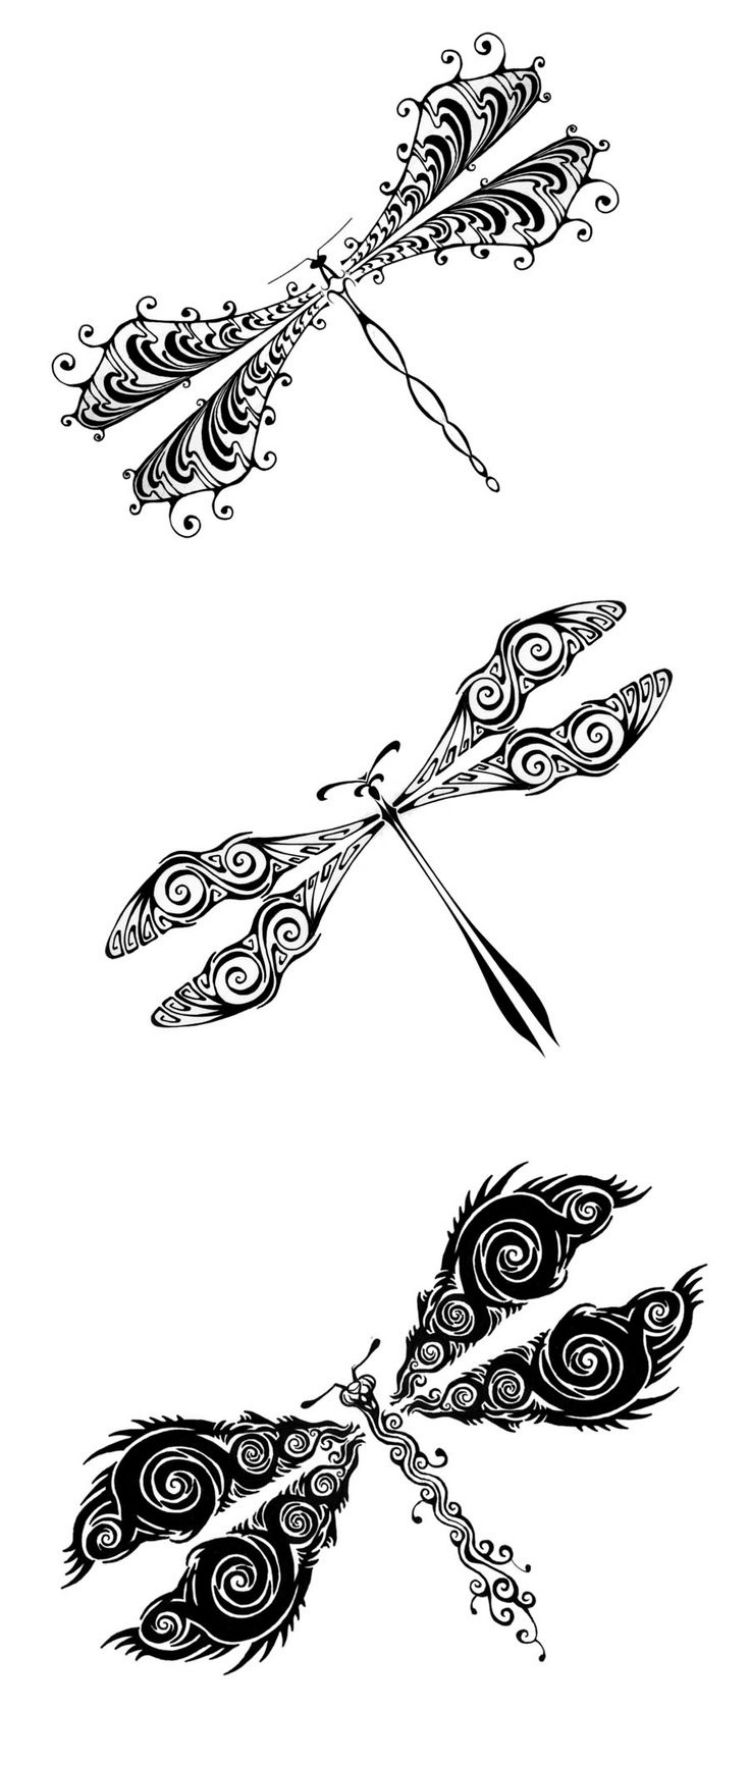 tattoo-vorlagen-libellen-tribal-design   Tattoo Motive   Pinterest ...